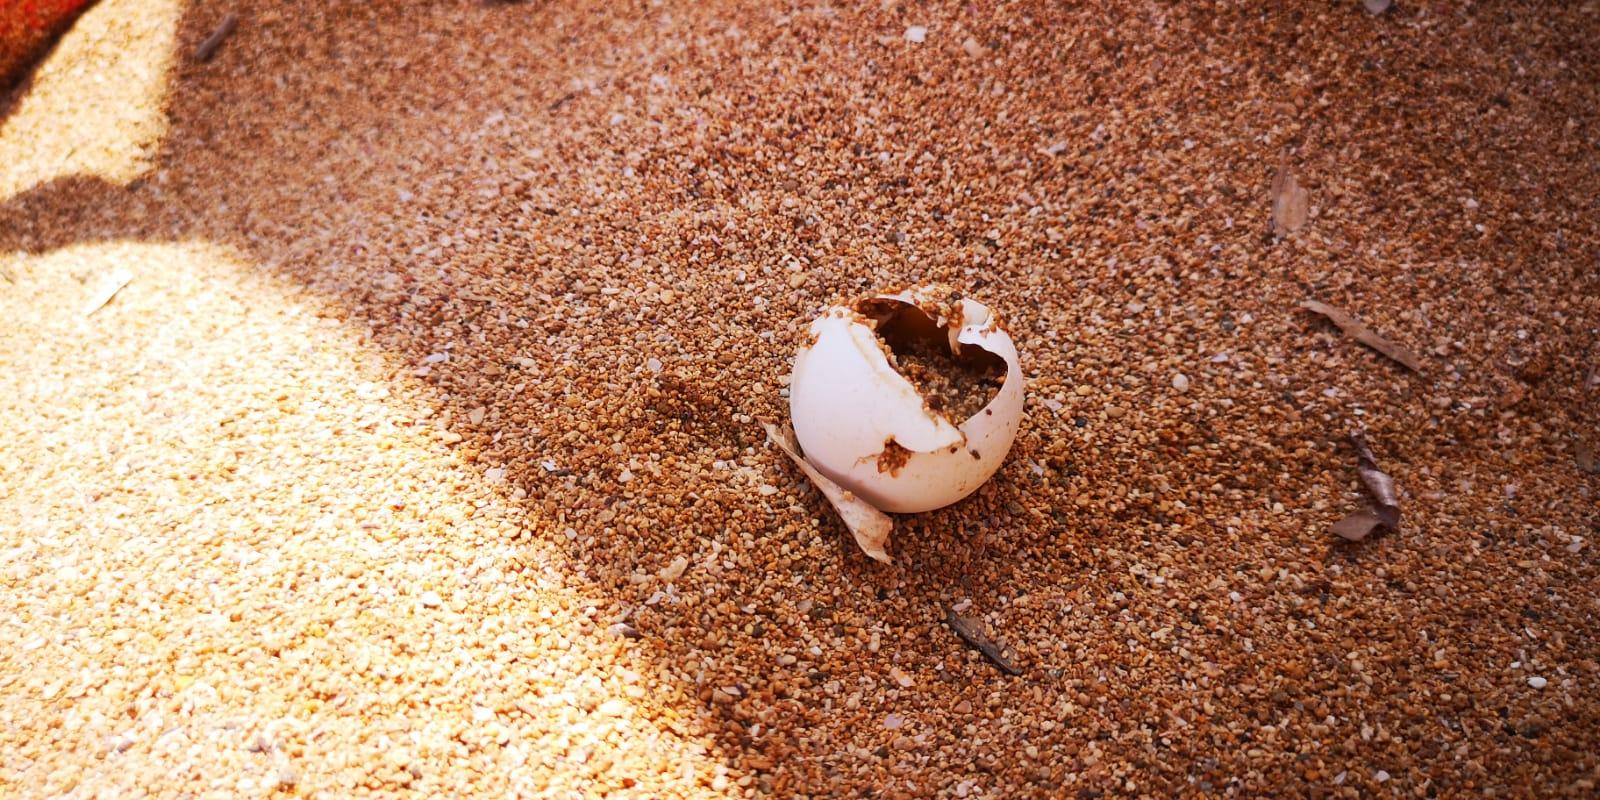 Caretta Caretta depone a Ognina: nido violato ma uova salve – VIDEO